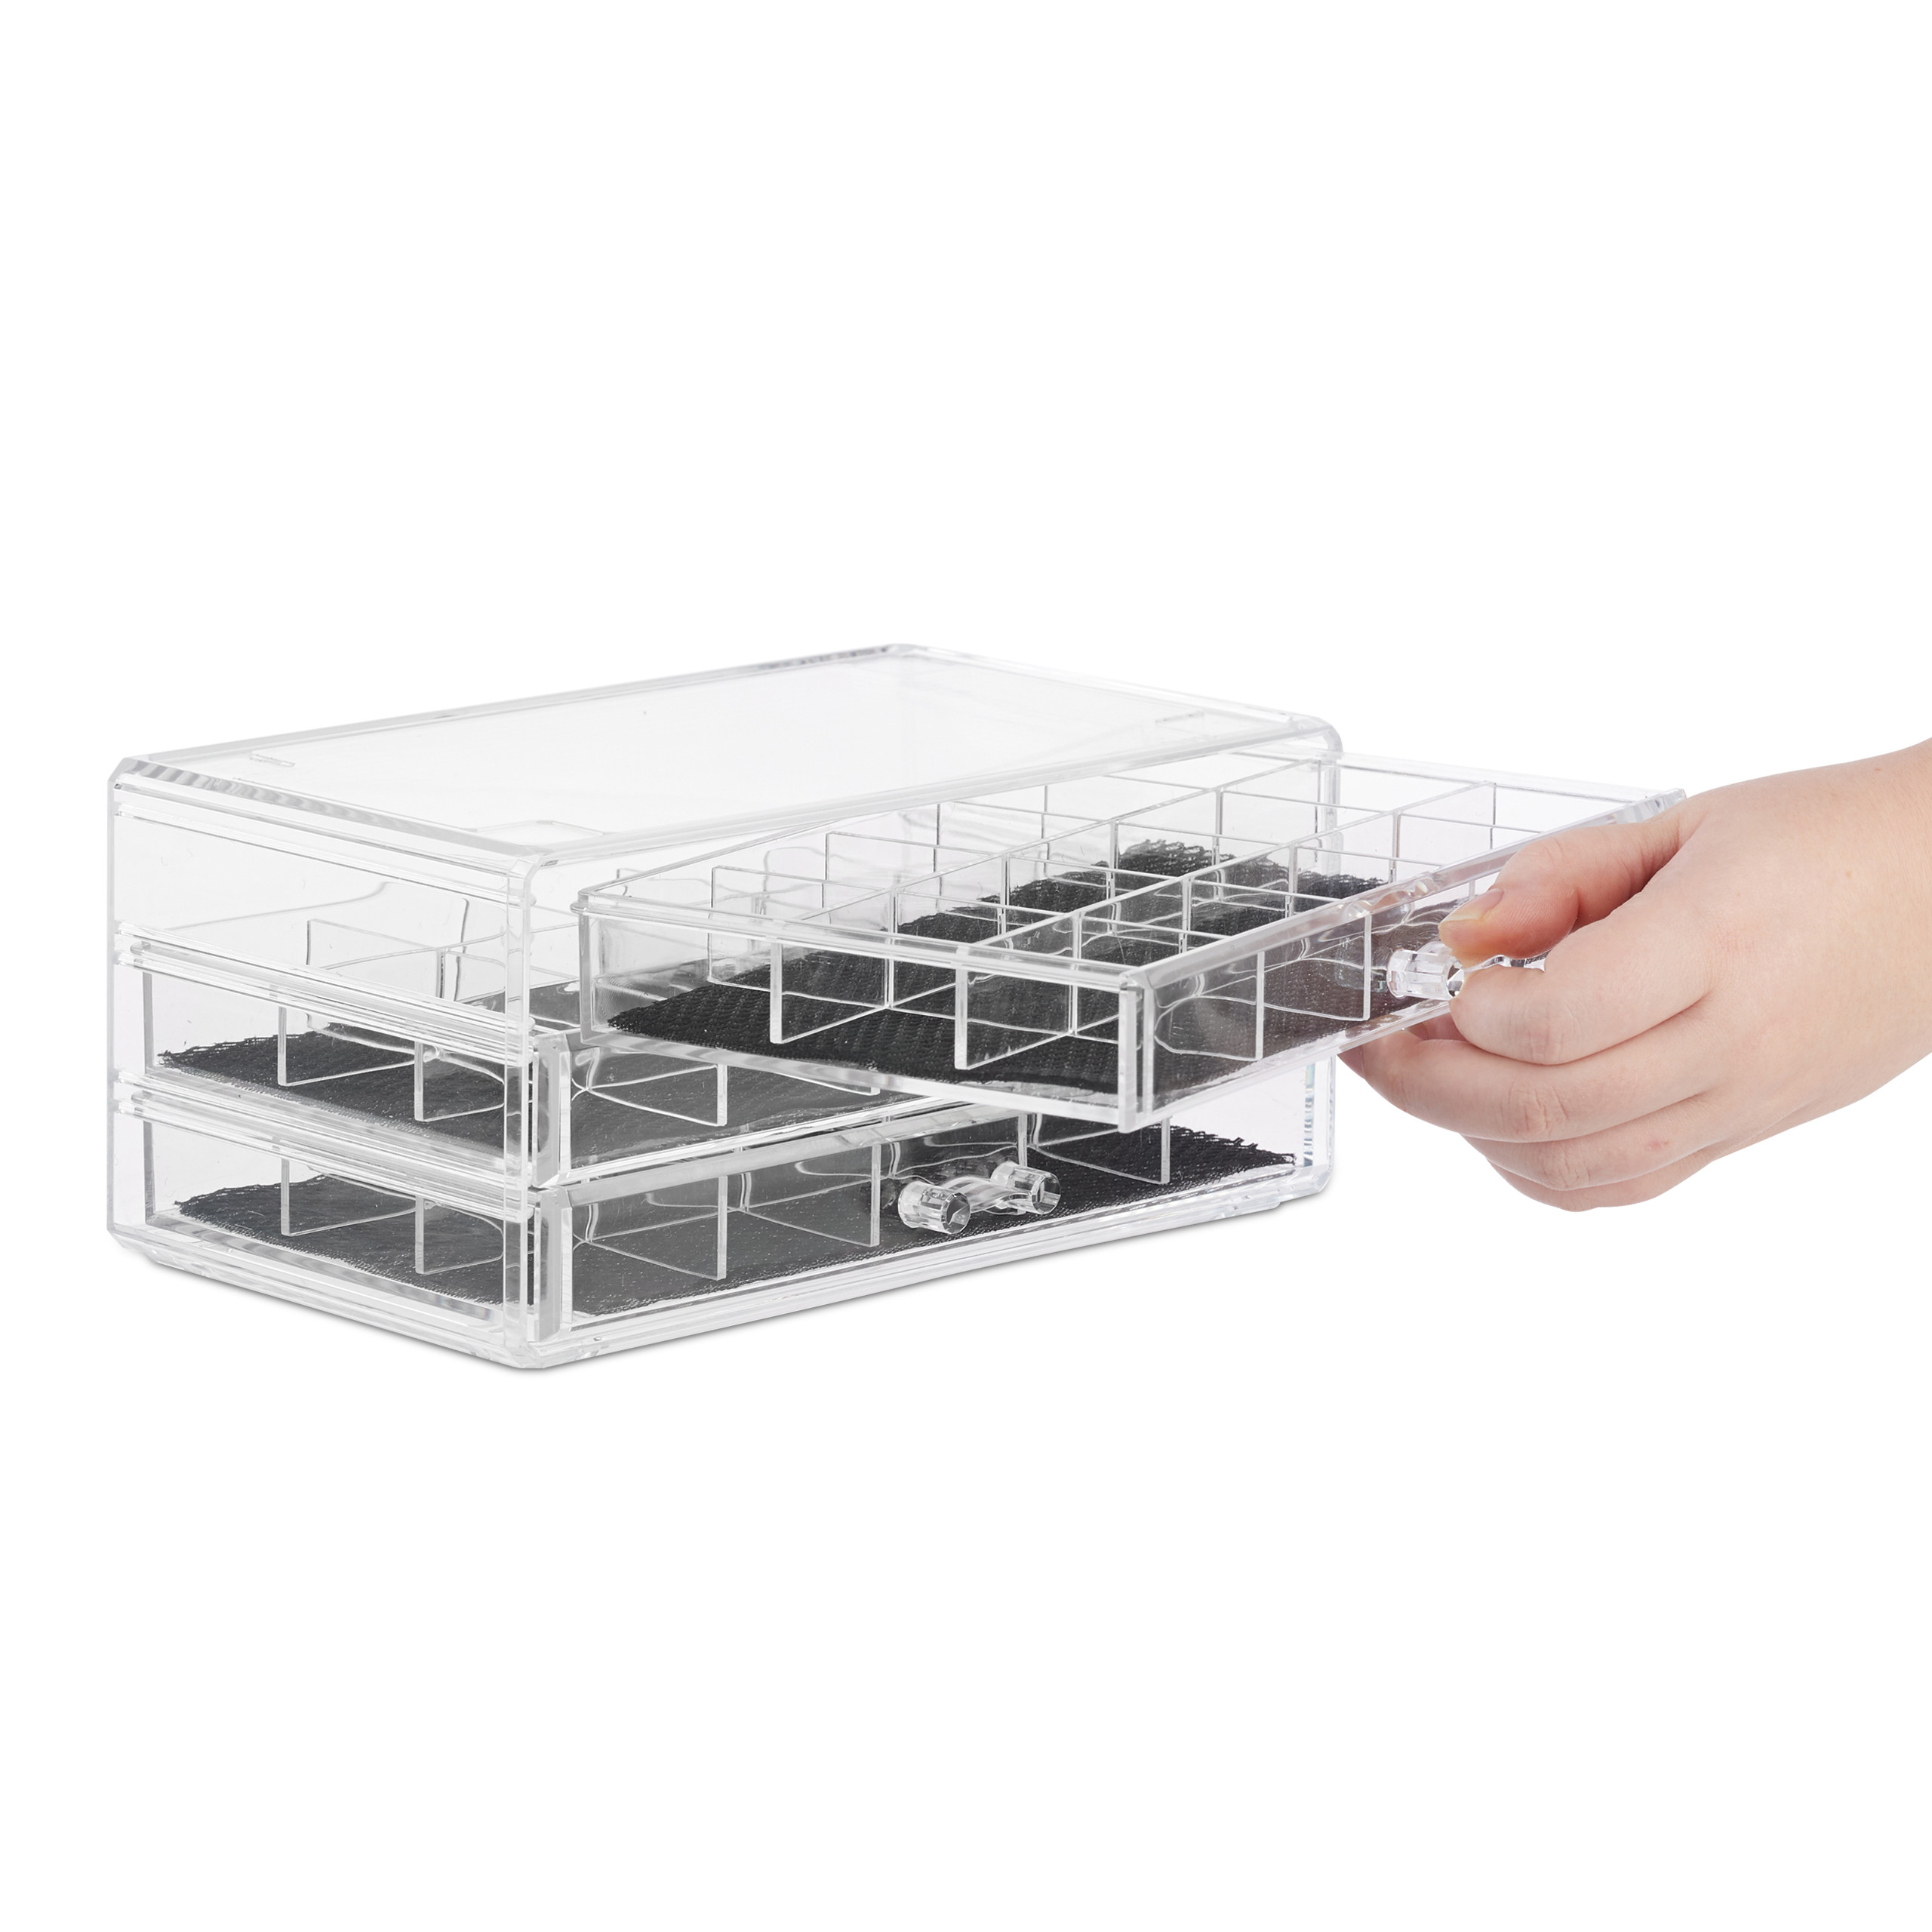 make-up-organizer-acryl-3-lades-met-vakken-acrylbox-cosmeticabox-opbergdoos miniatuur 10